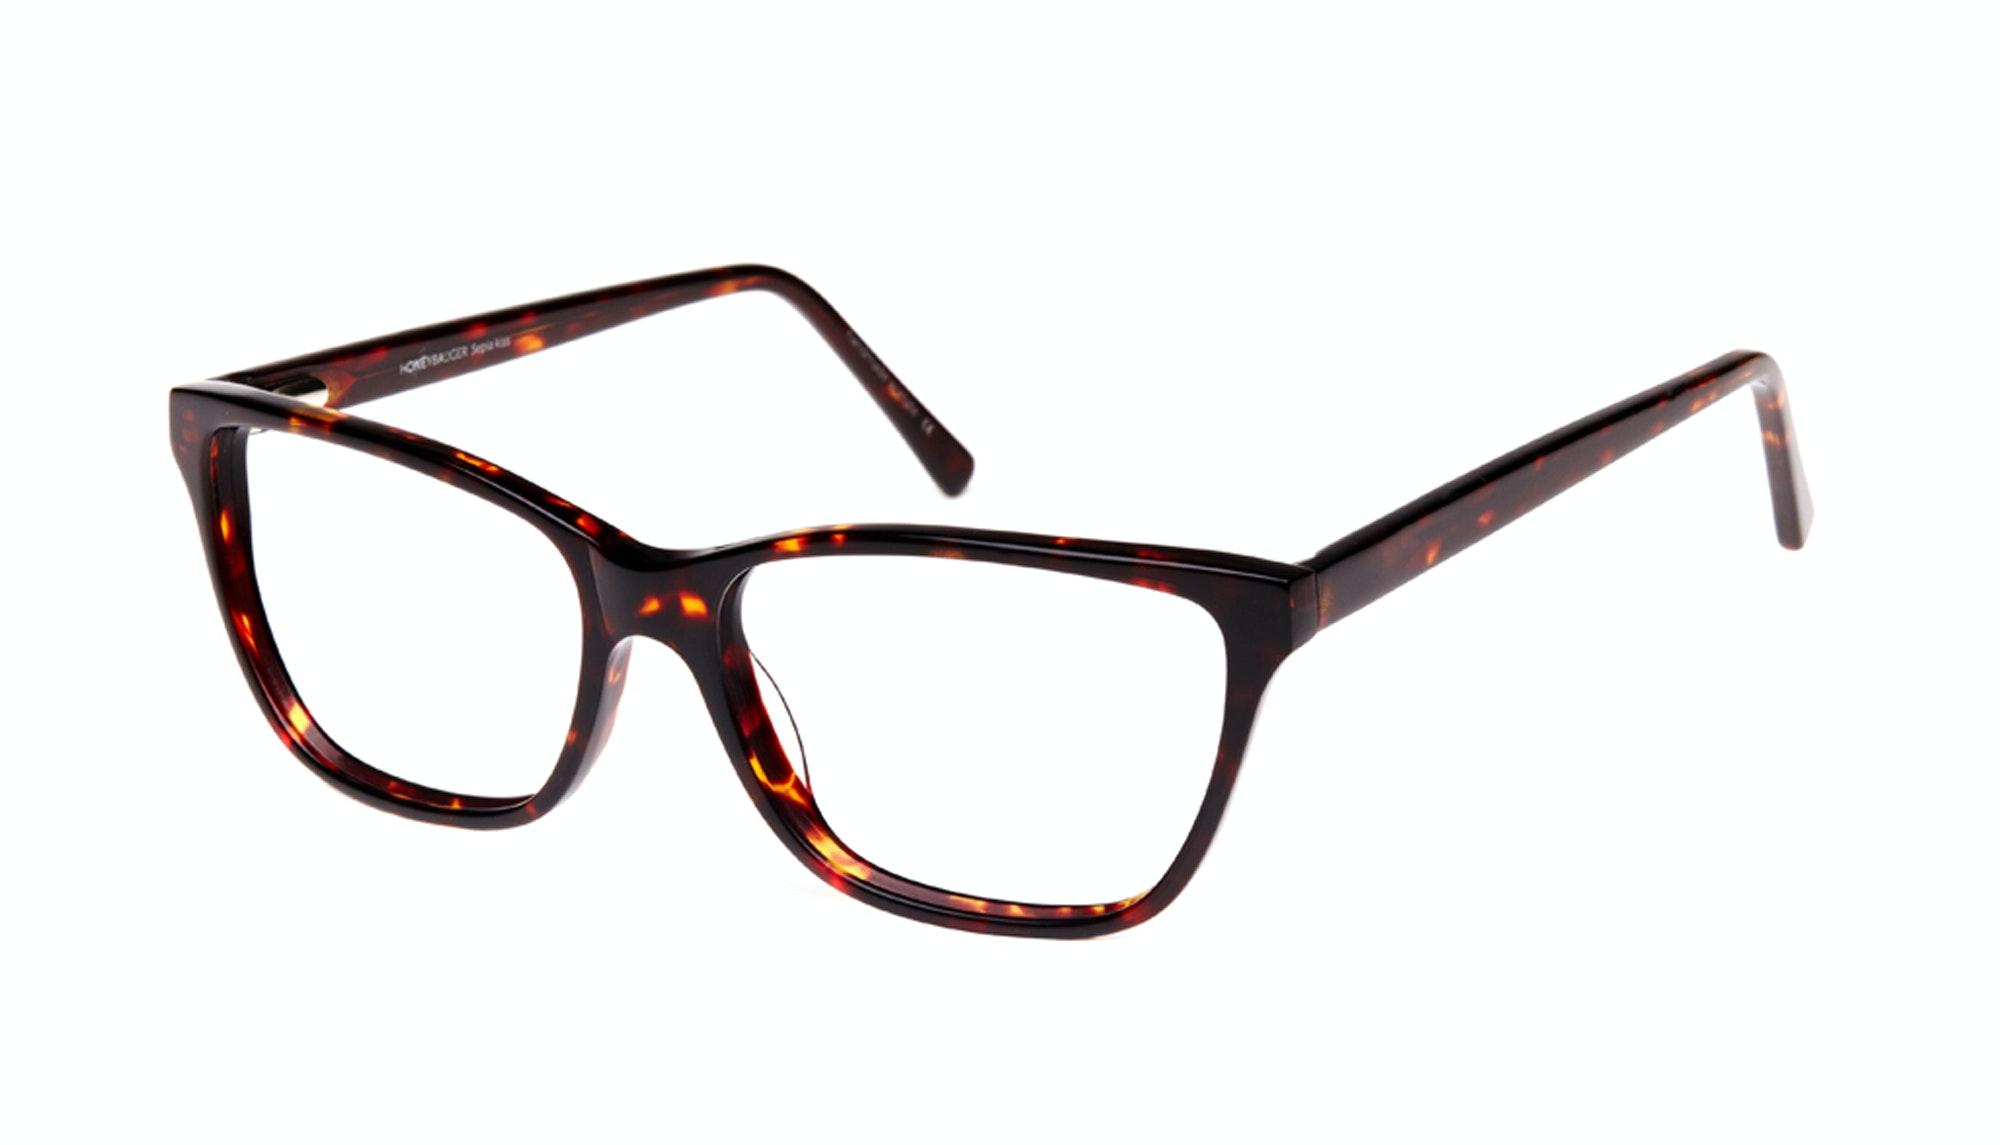 Affordable Fashion Glasses Rectangle Eyeglasses Women Honeybadger Sepia Kiss Tilt